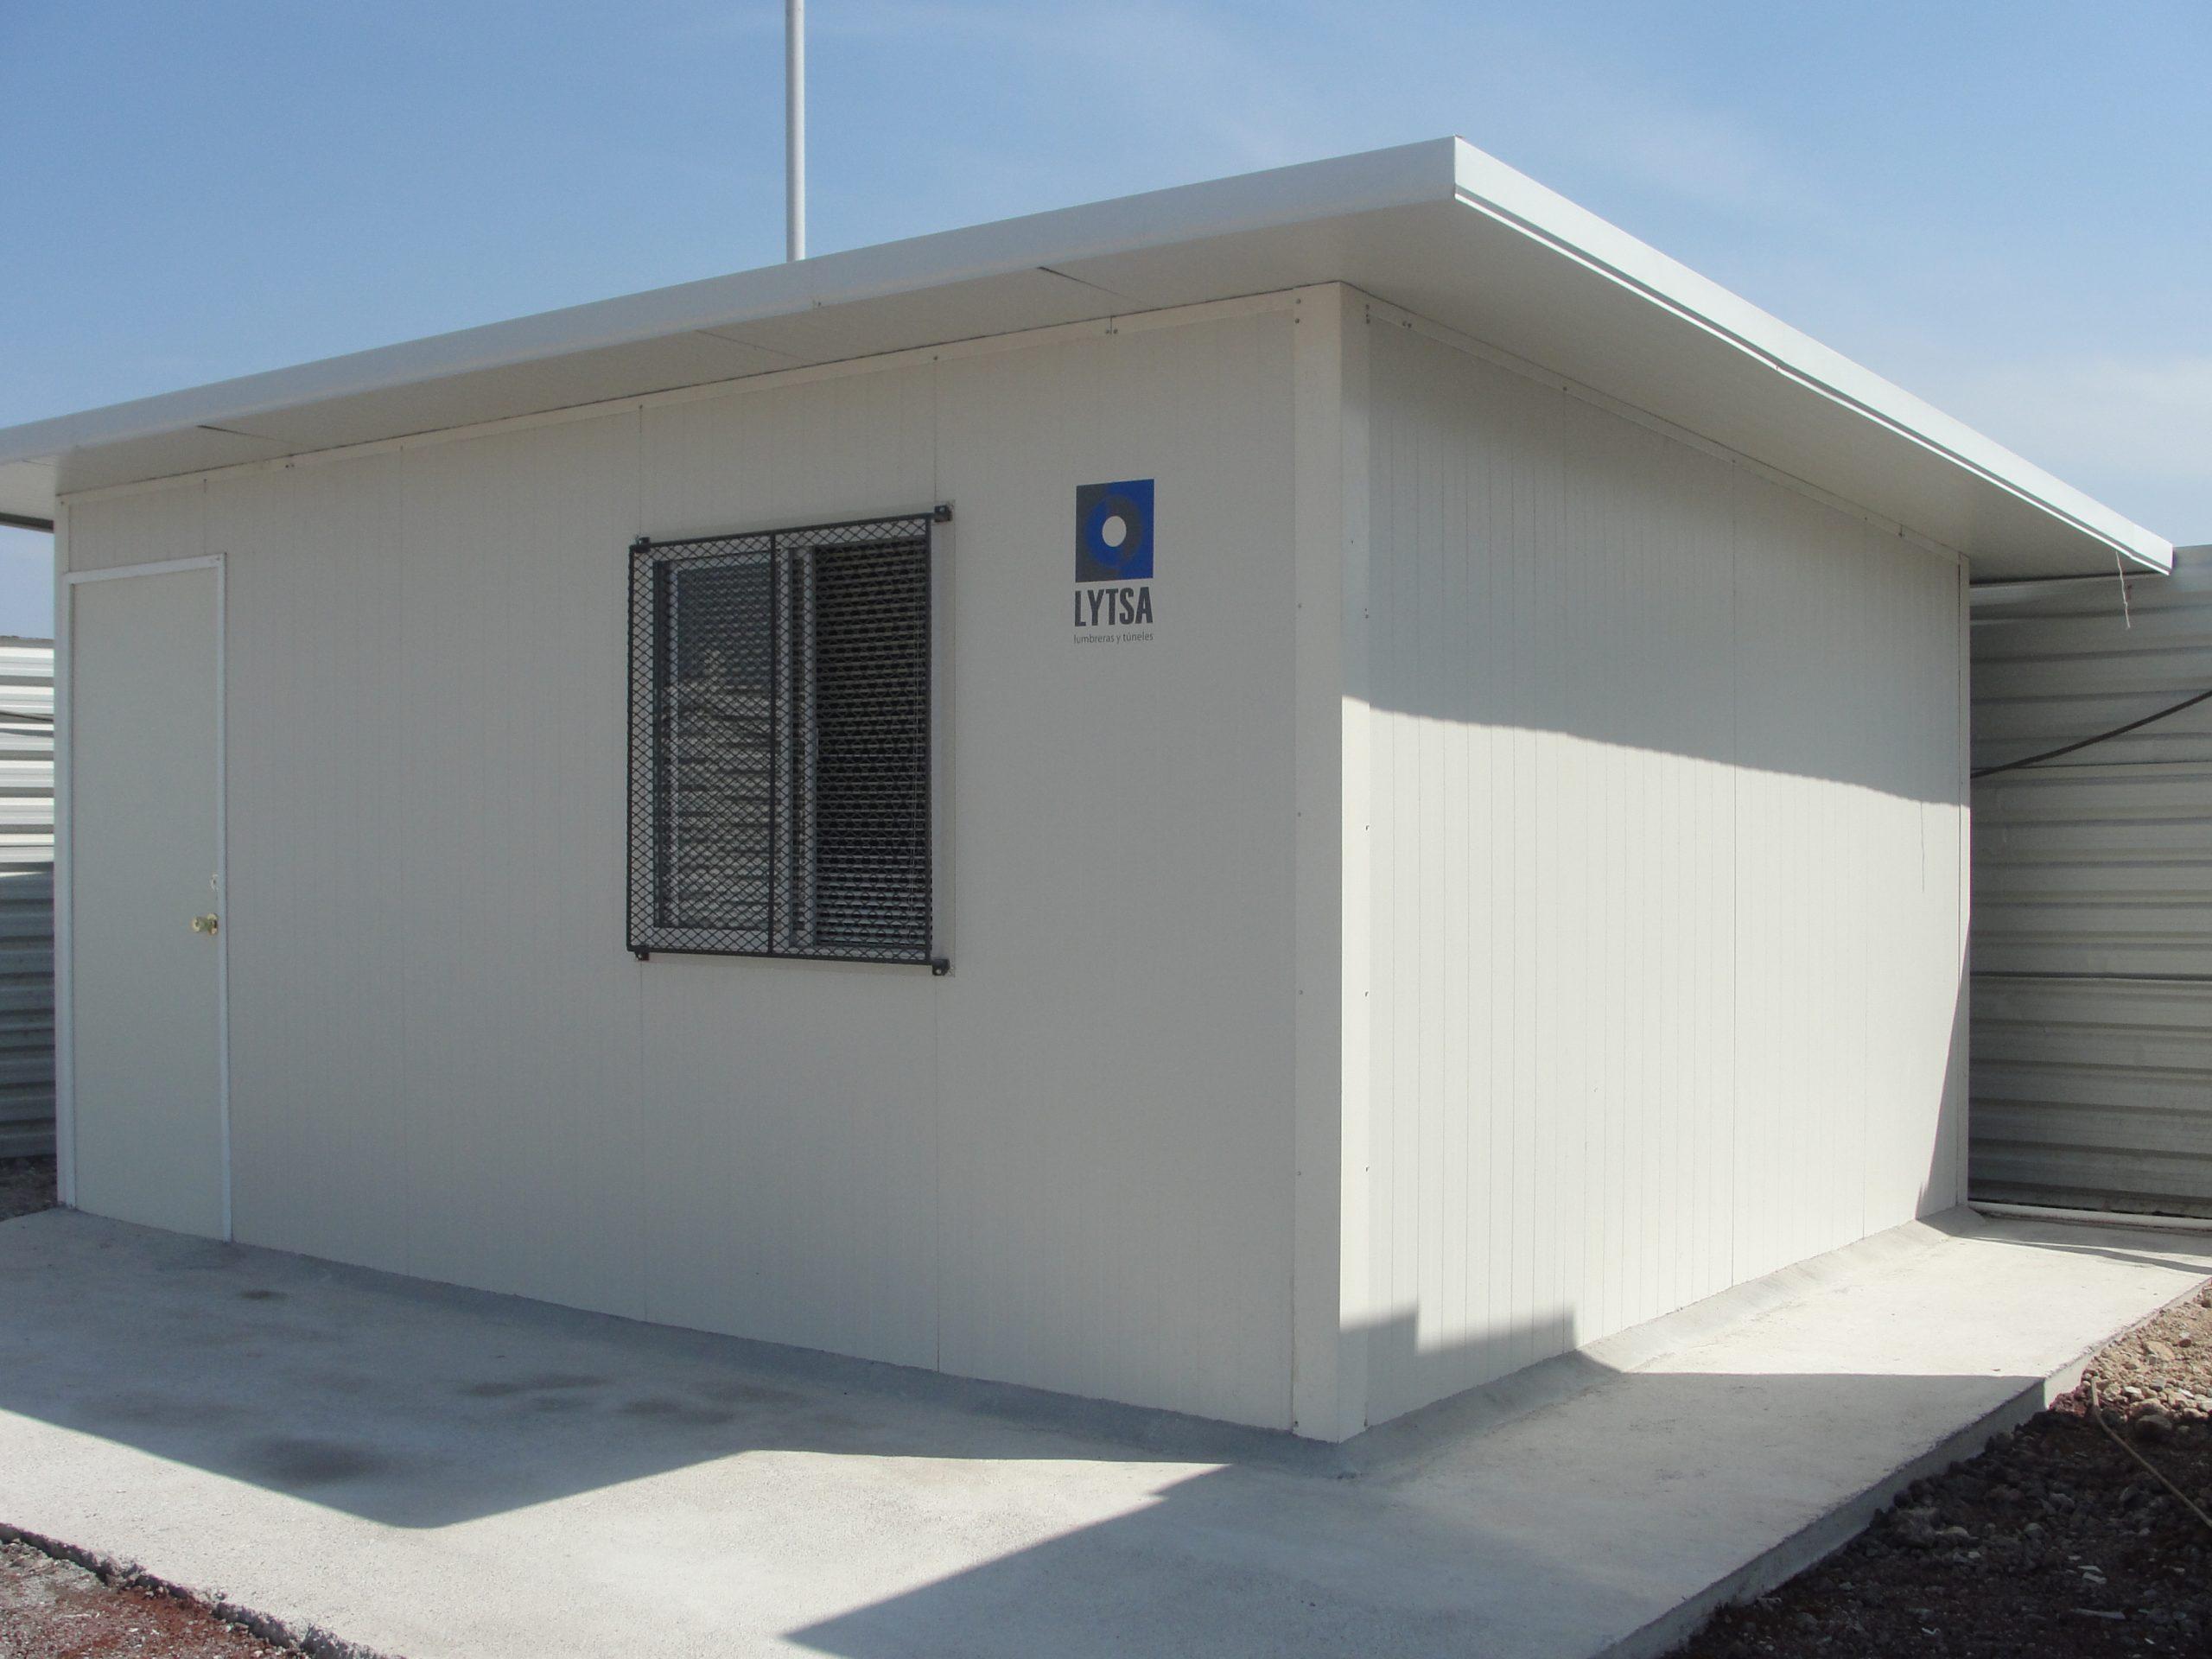 Desplante para muros de panel aislante